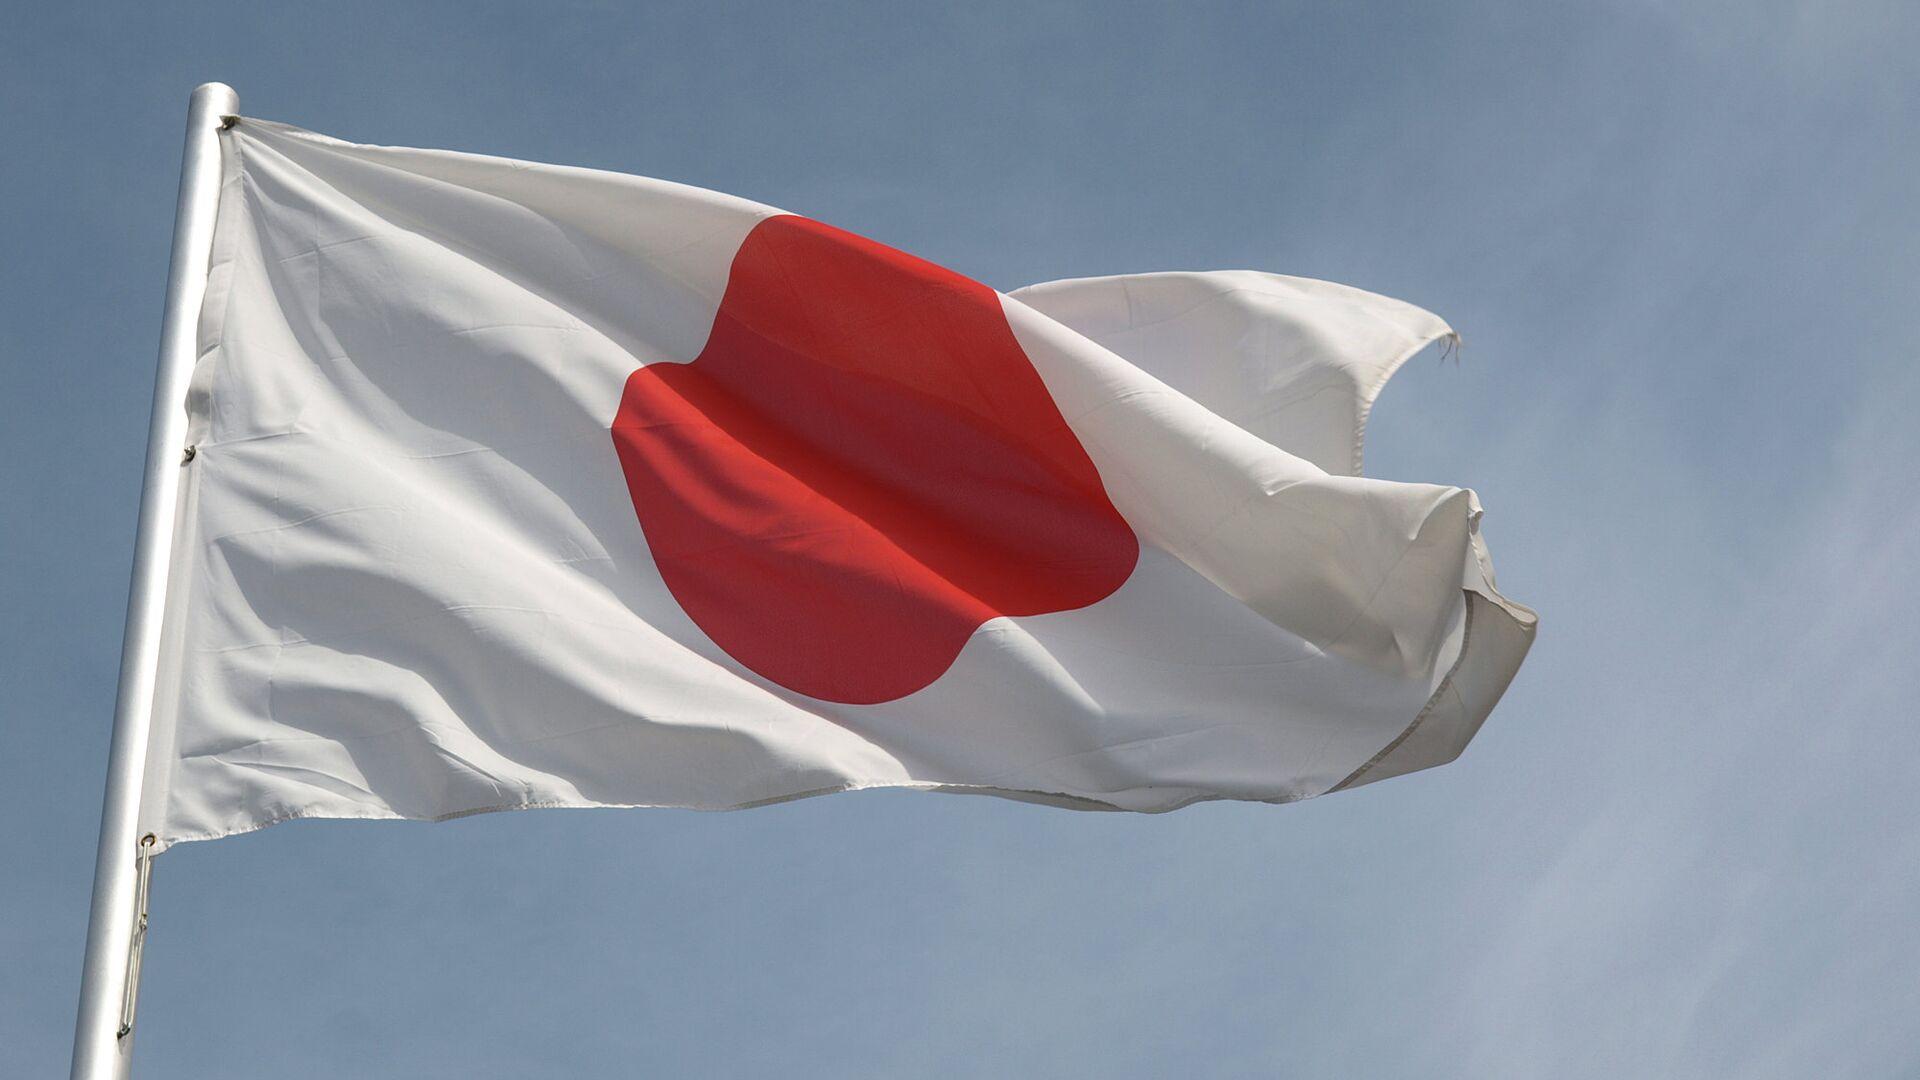 Флаг Японии - РИА Новости, 1920, 16.09.2020